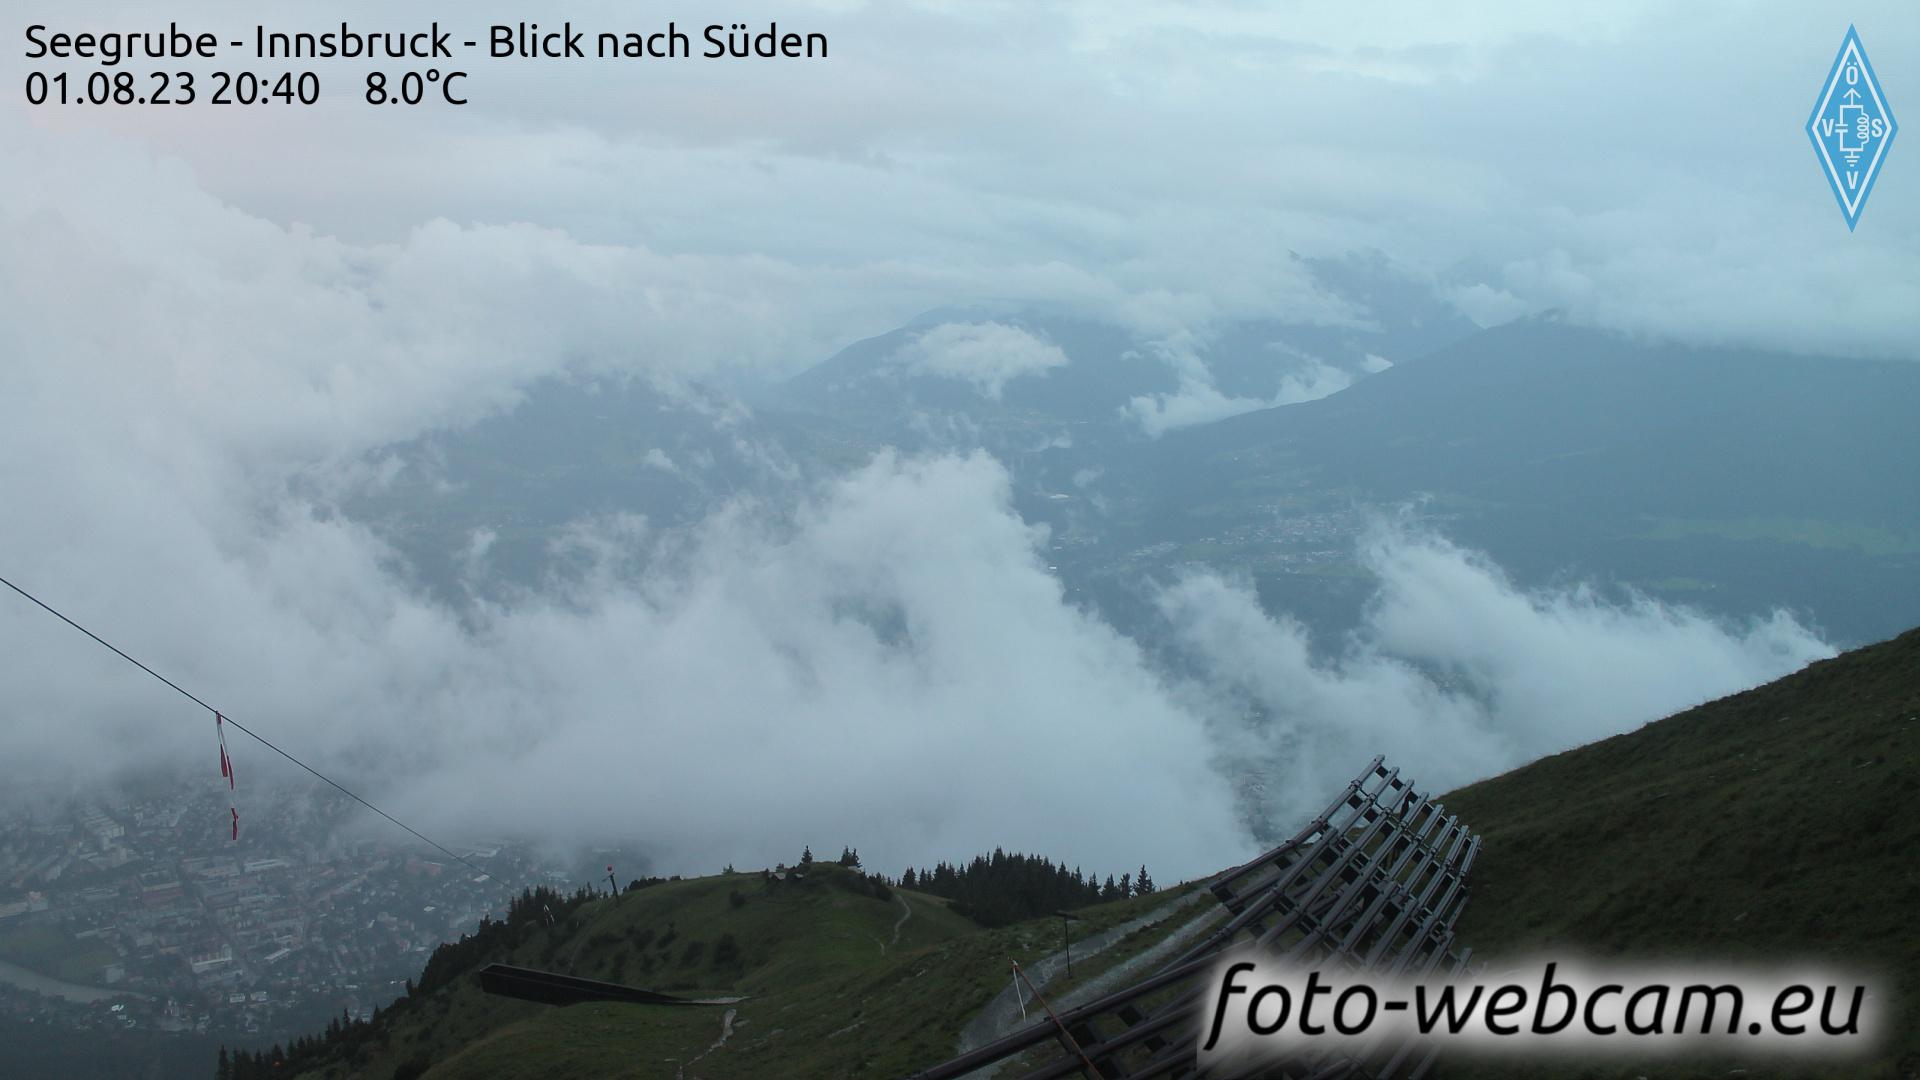 Innsbruck Wed. 20:18